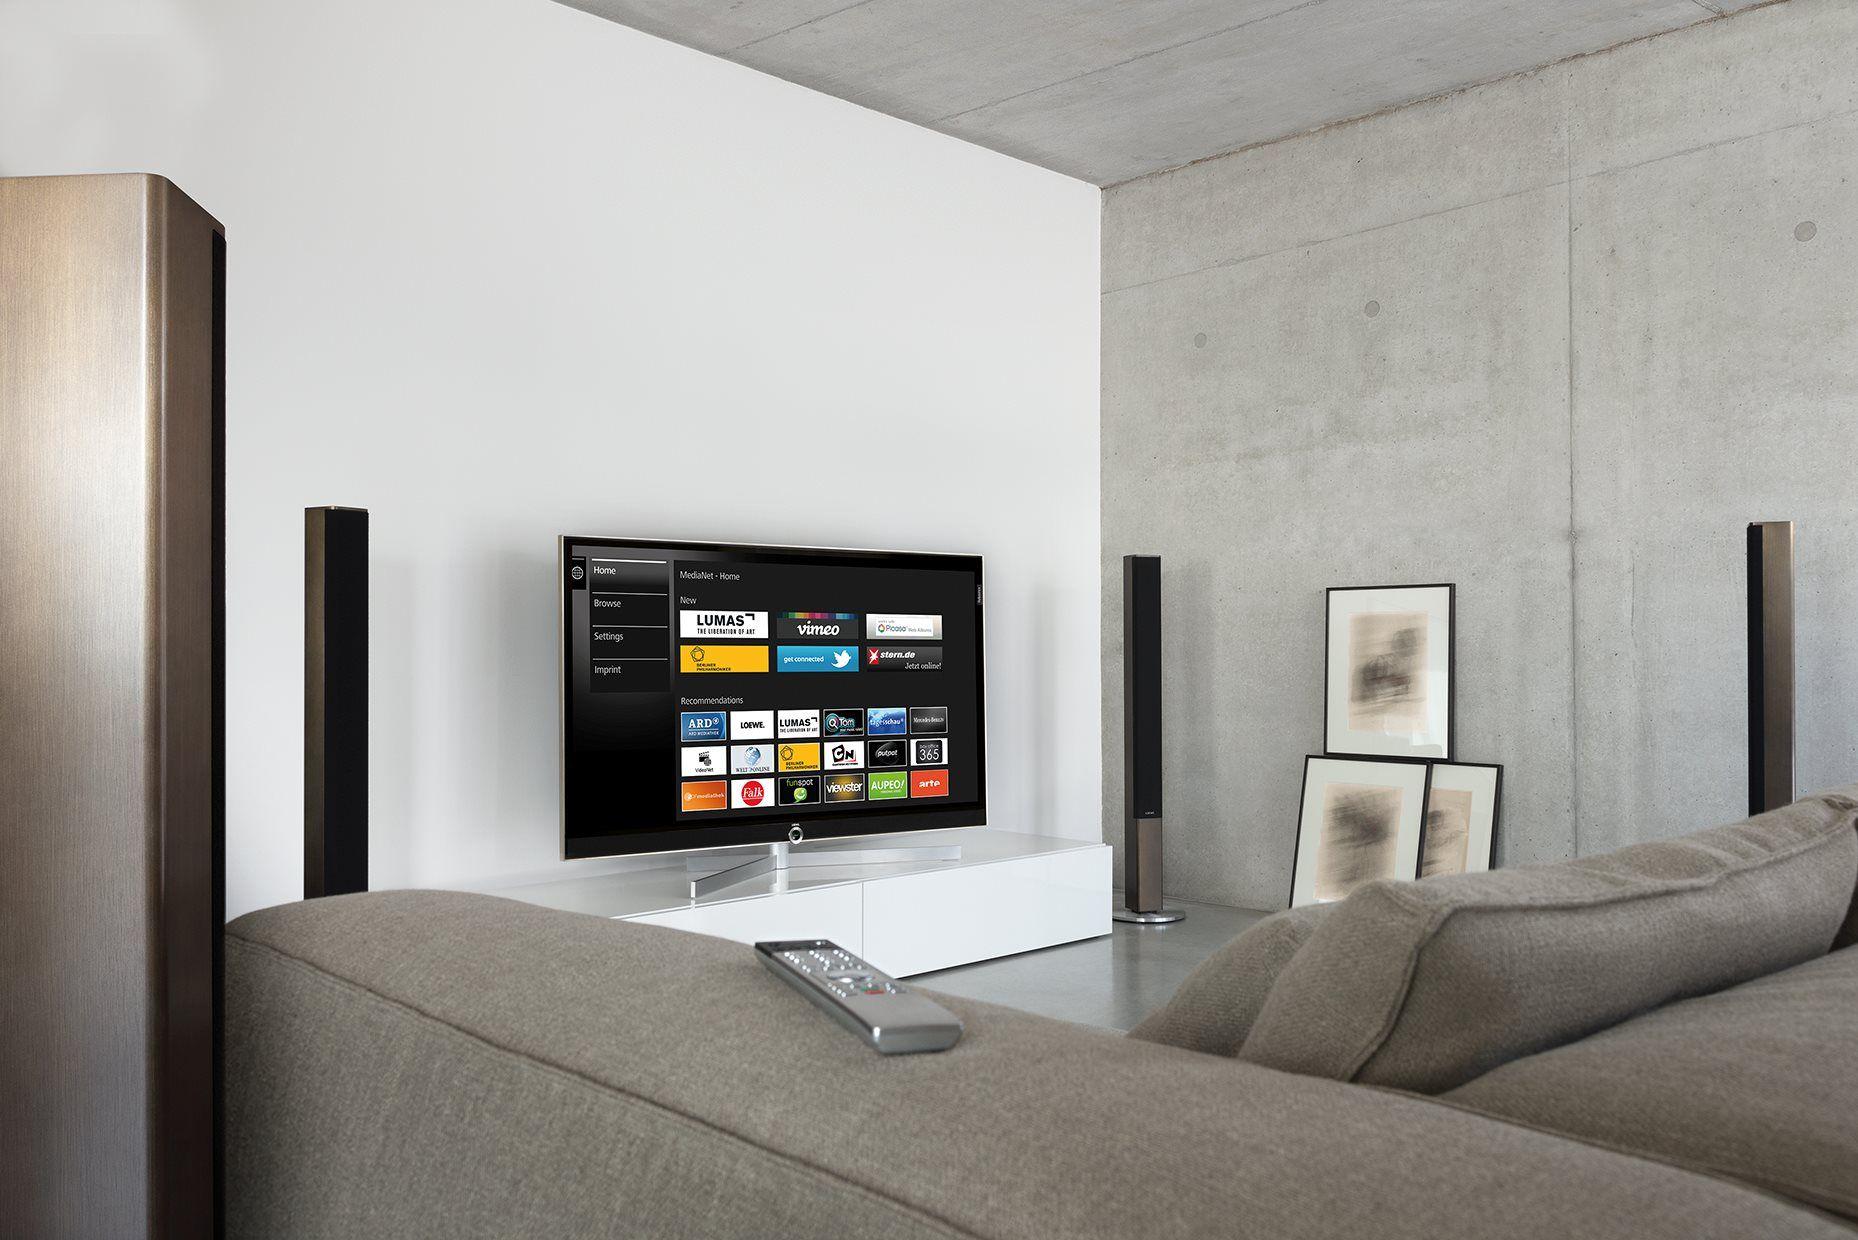 Loewe Tv Loewe Reference 55 In The New Color Variant Dark Gold  # Deco Table Tele Plus Homecimema